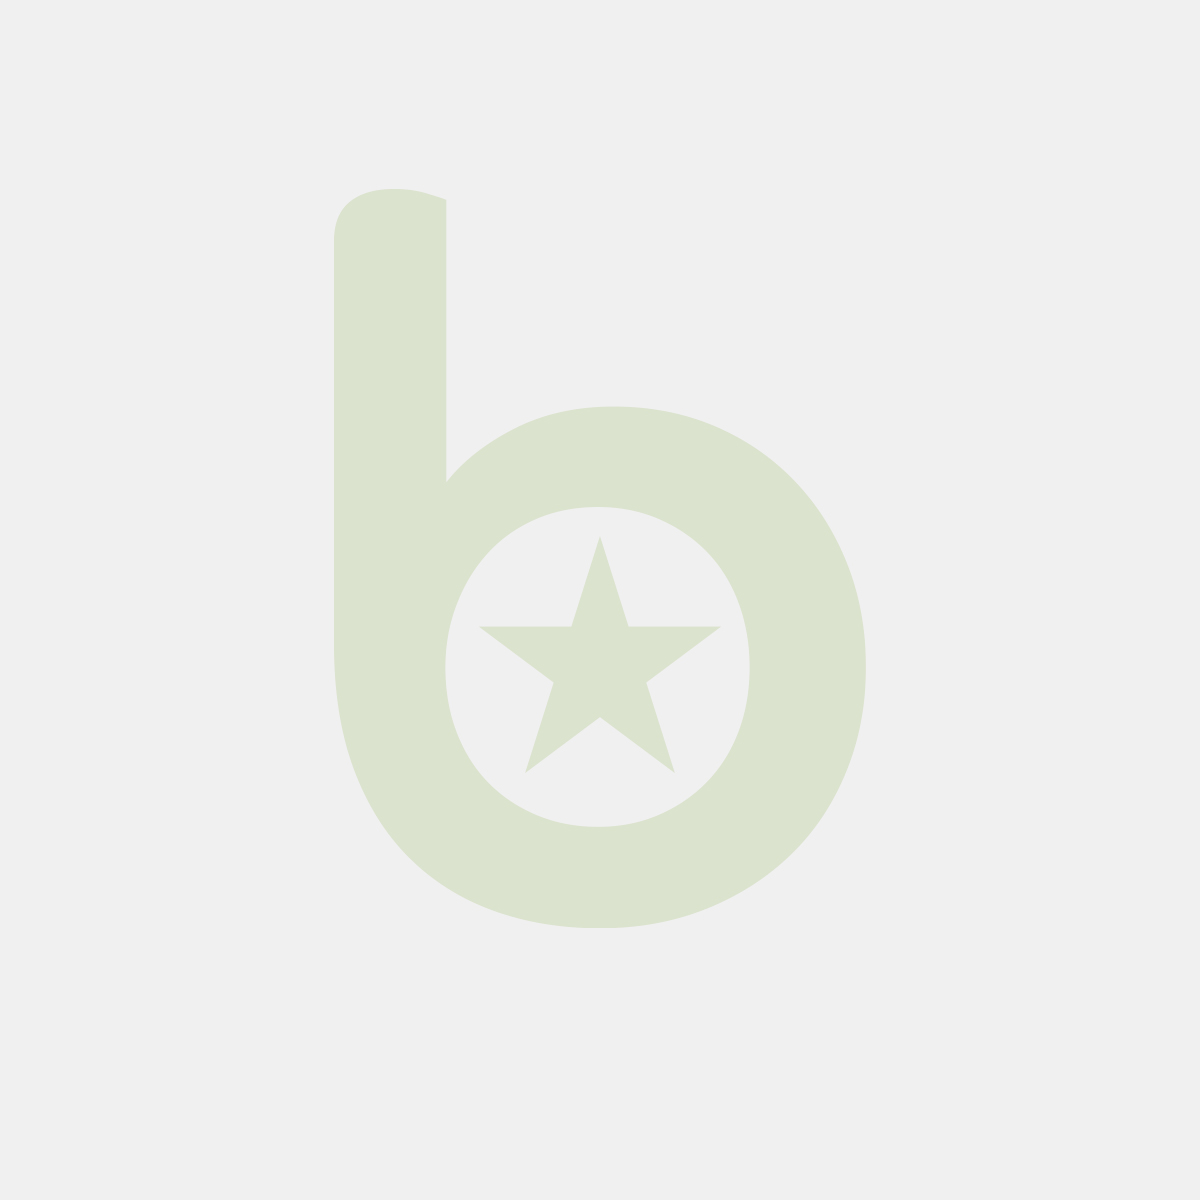 Pokrywka PET do tacki brązowej 850ml op. 20 szt